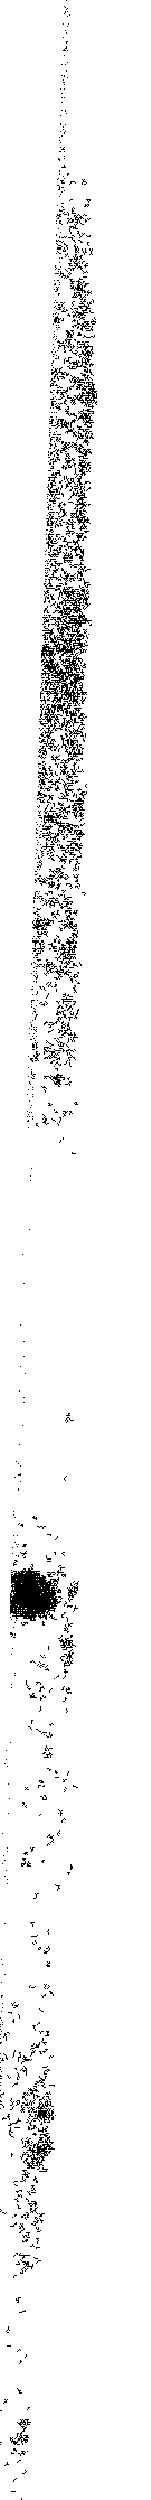 [graphic][graphic][graphic][graphic]